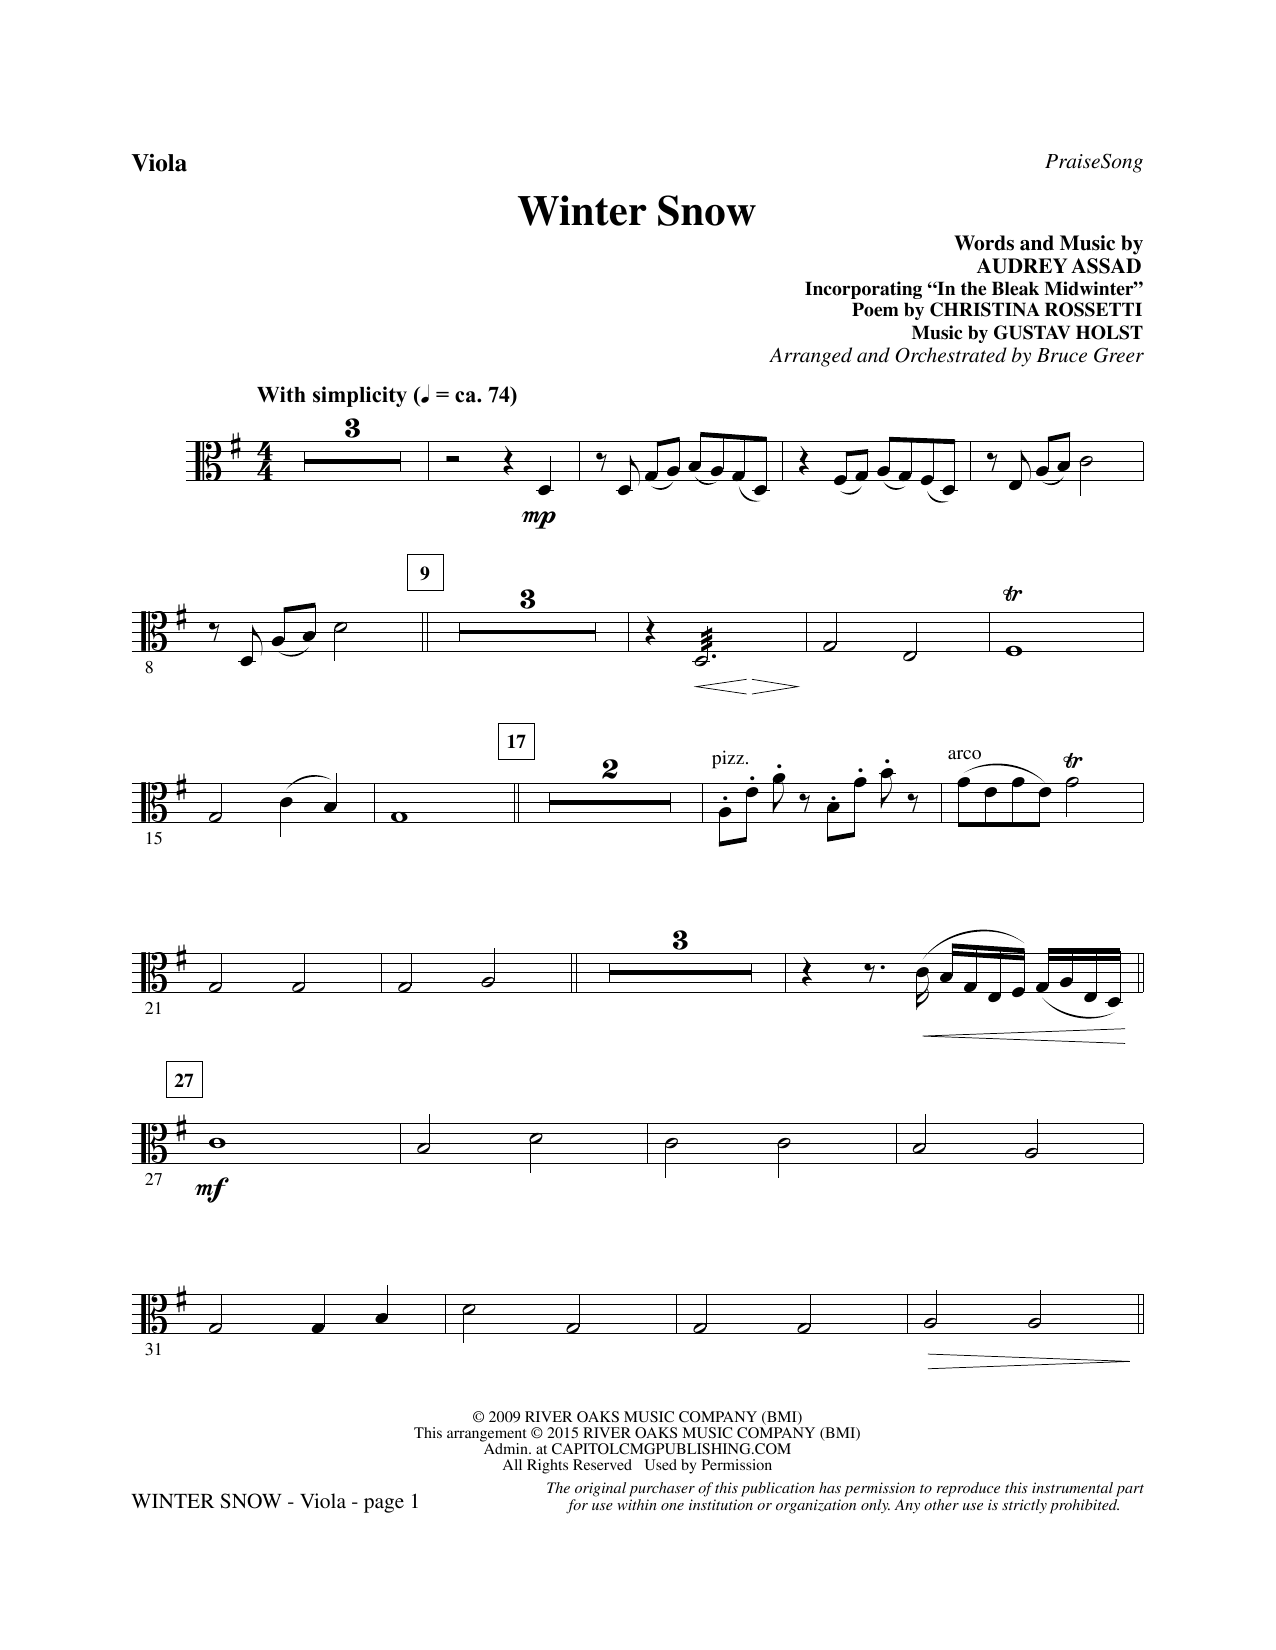 Winter Snow - Viola sheet music